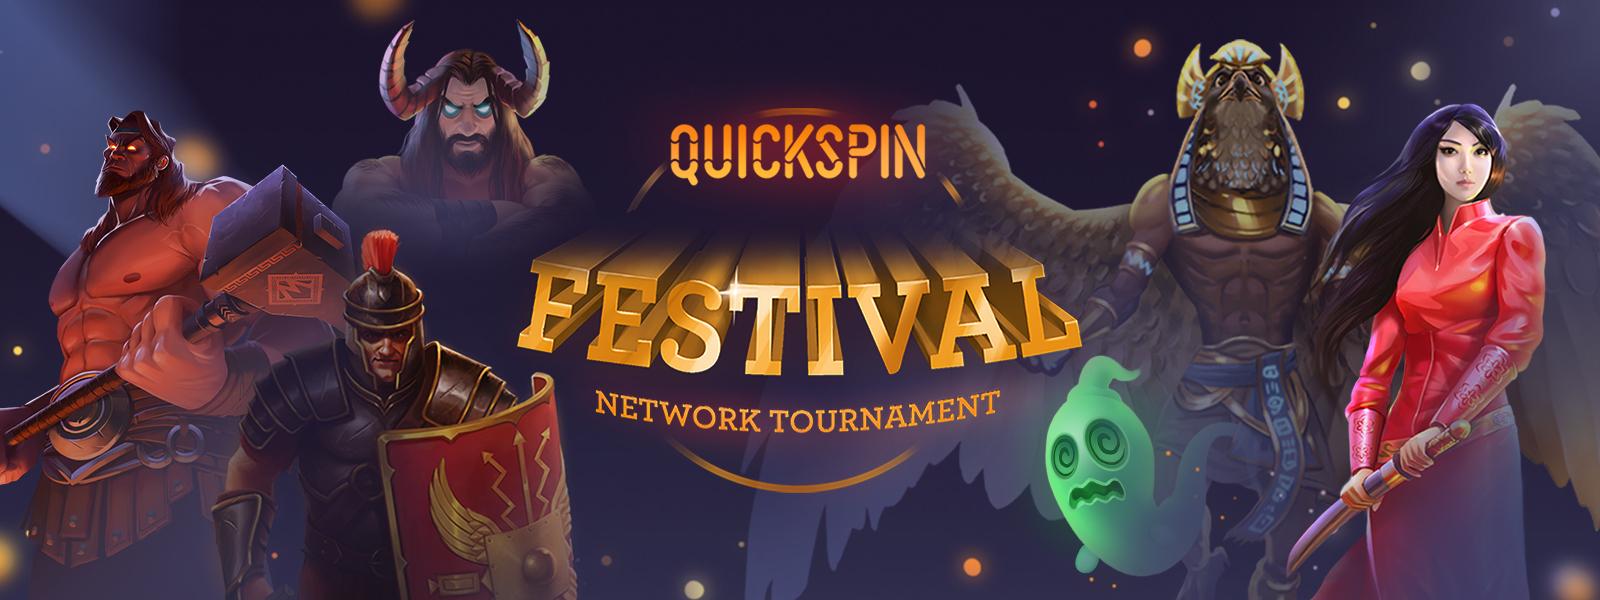 Quickspin Festival - Network Promotion